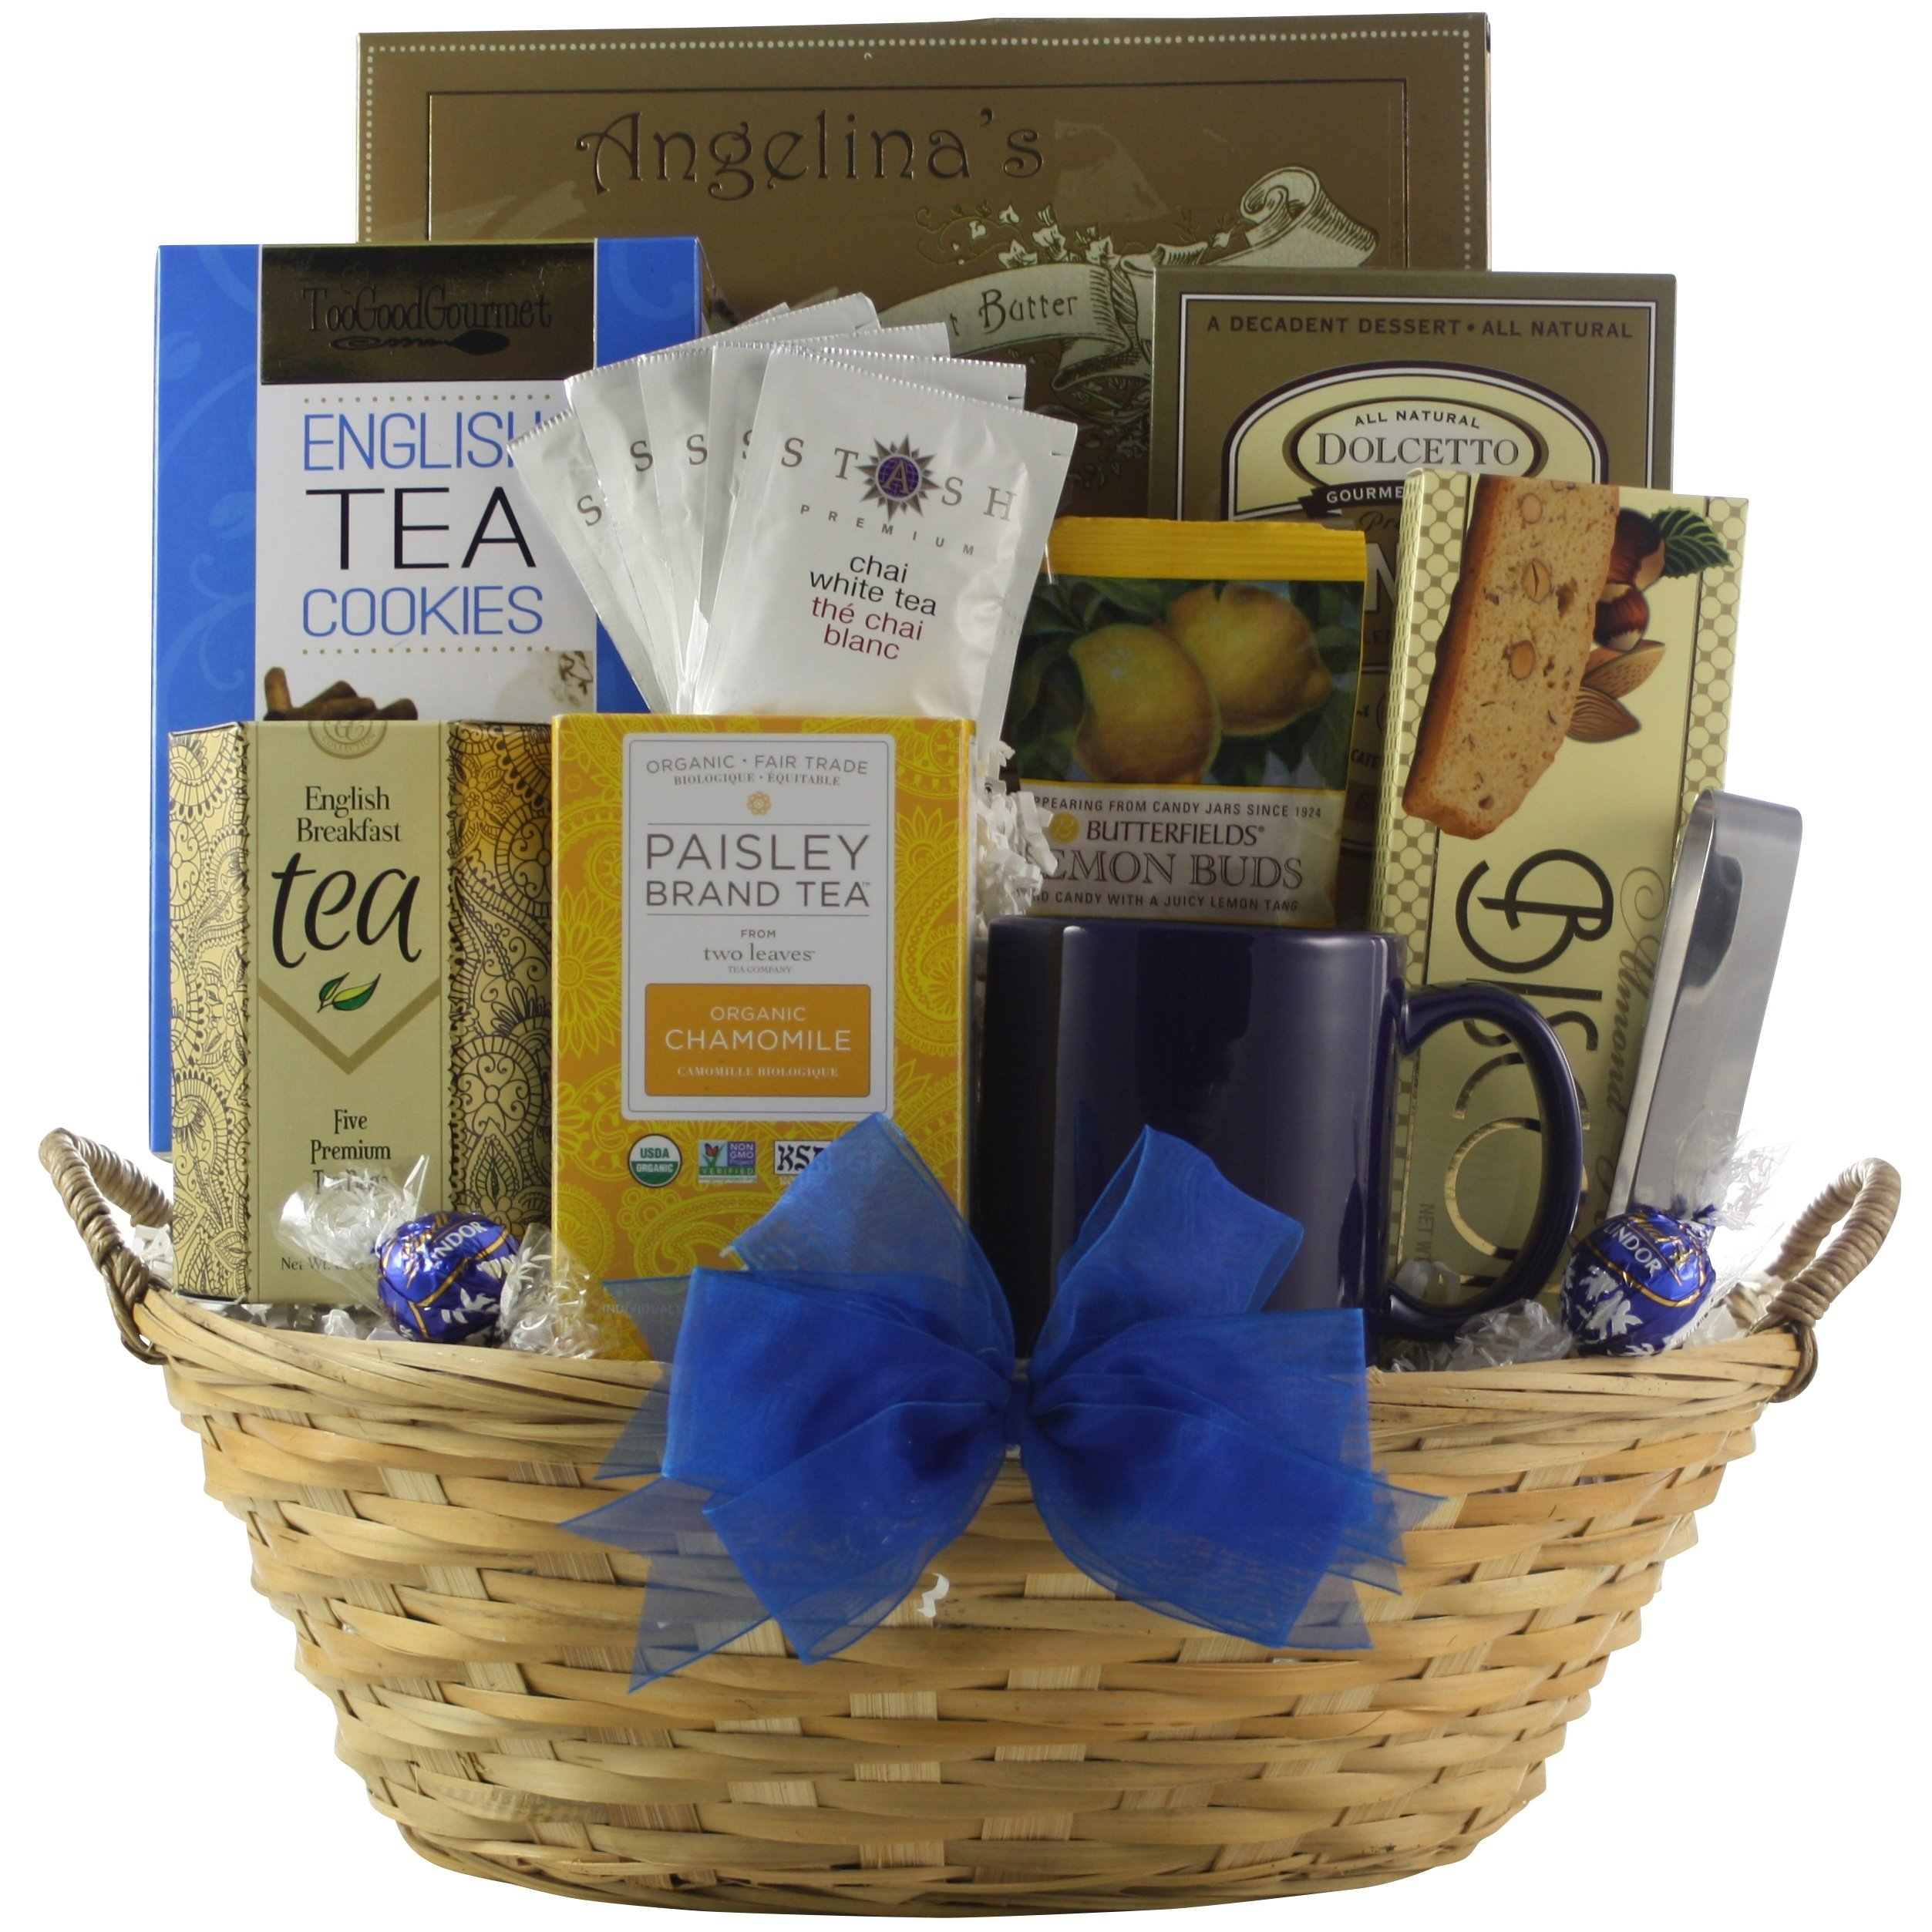 GreatArrivals Connoisseur Gourmet Tea Gift Basket